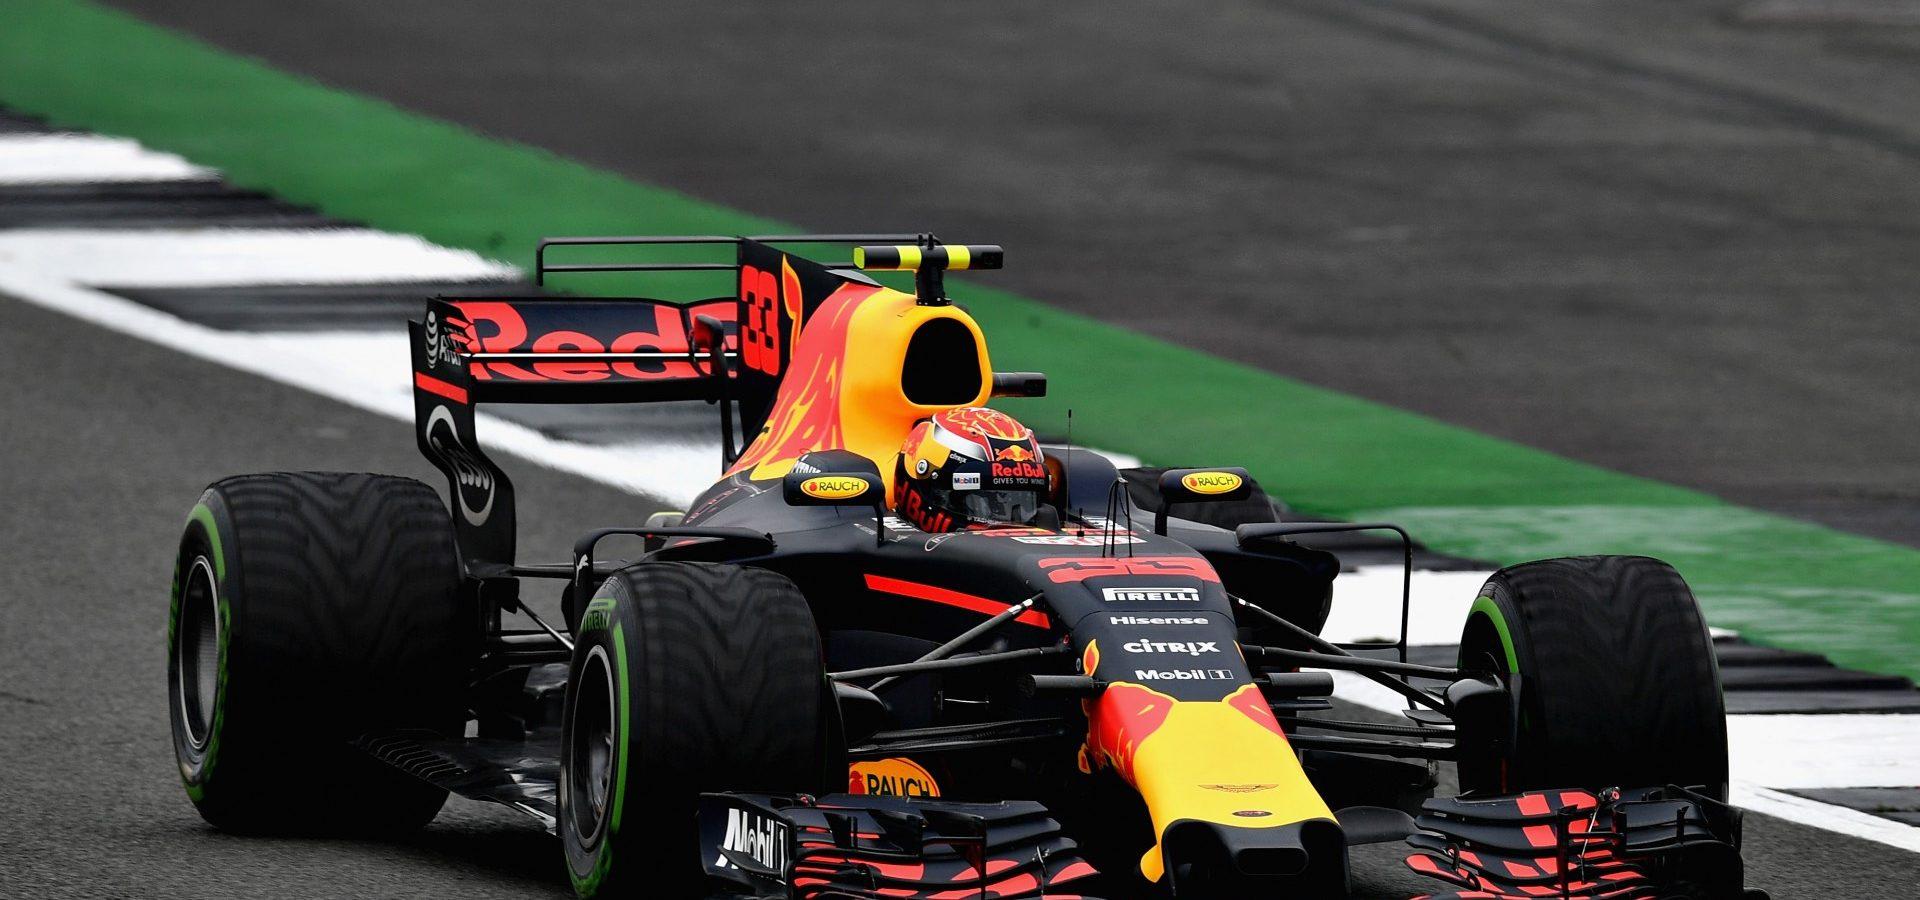 F1 Grand Prix of Great Britain - Qualifying